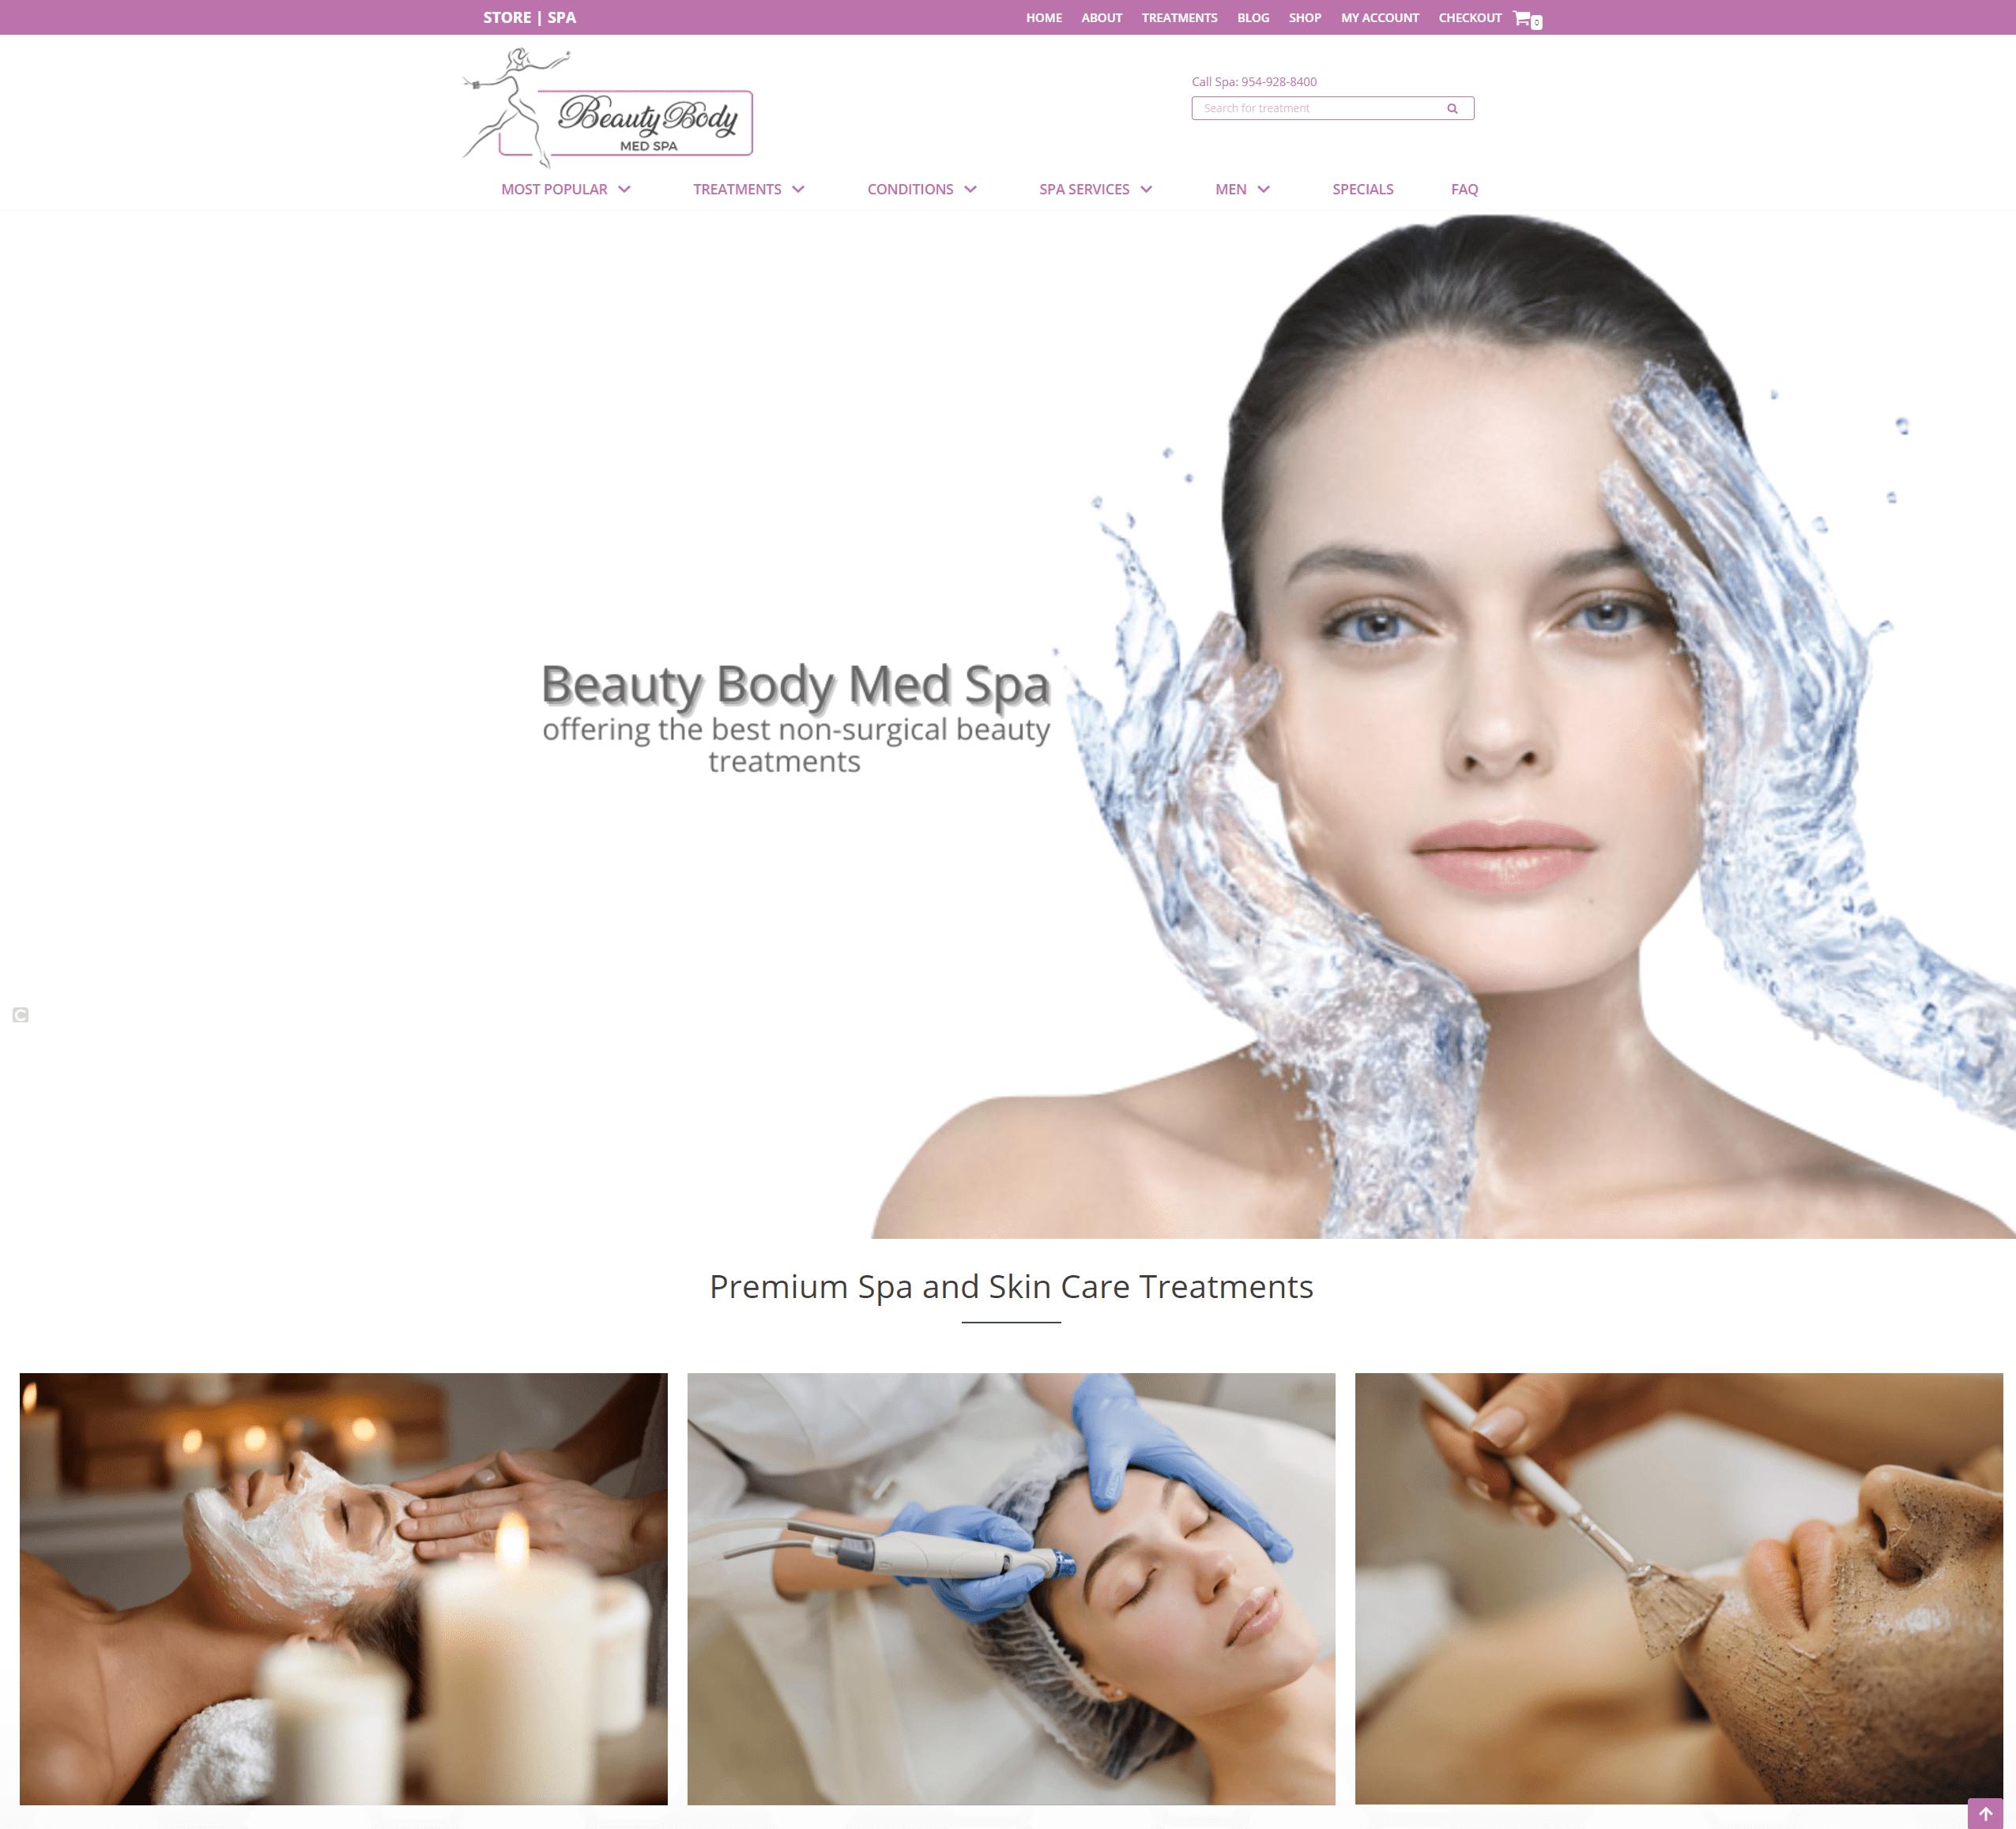 Beauty Body Med Spa website design